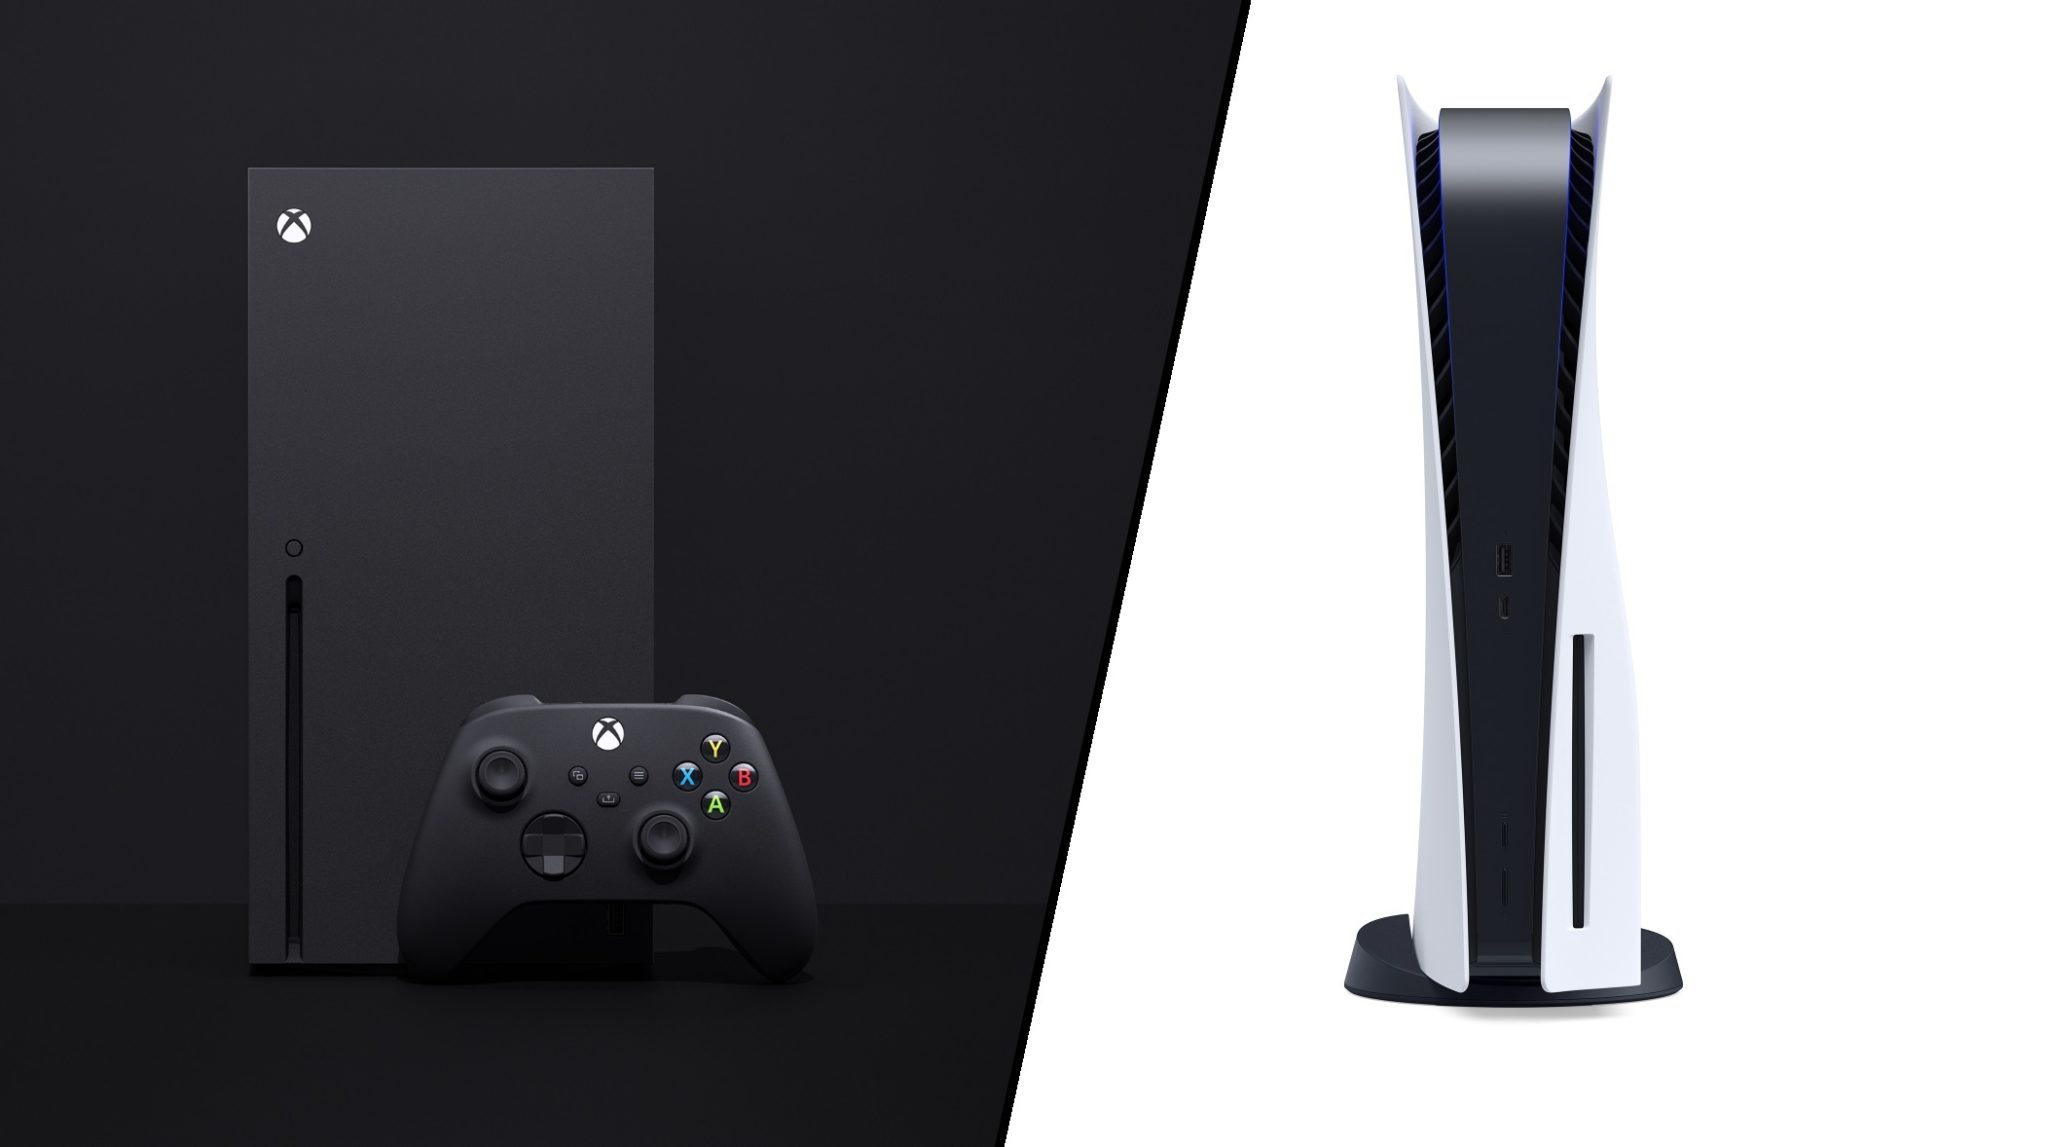 playstation-5-vs-xbox-series-x